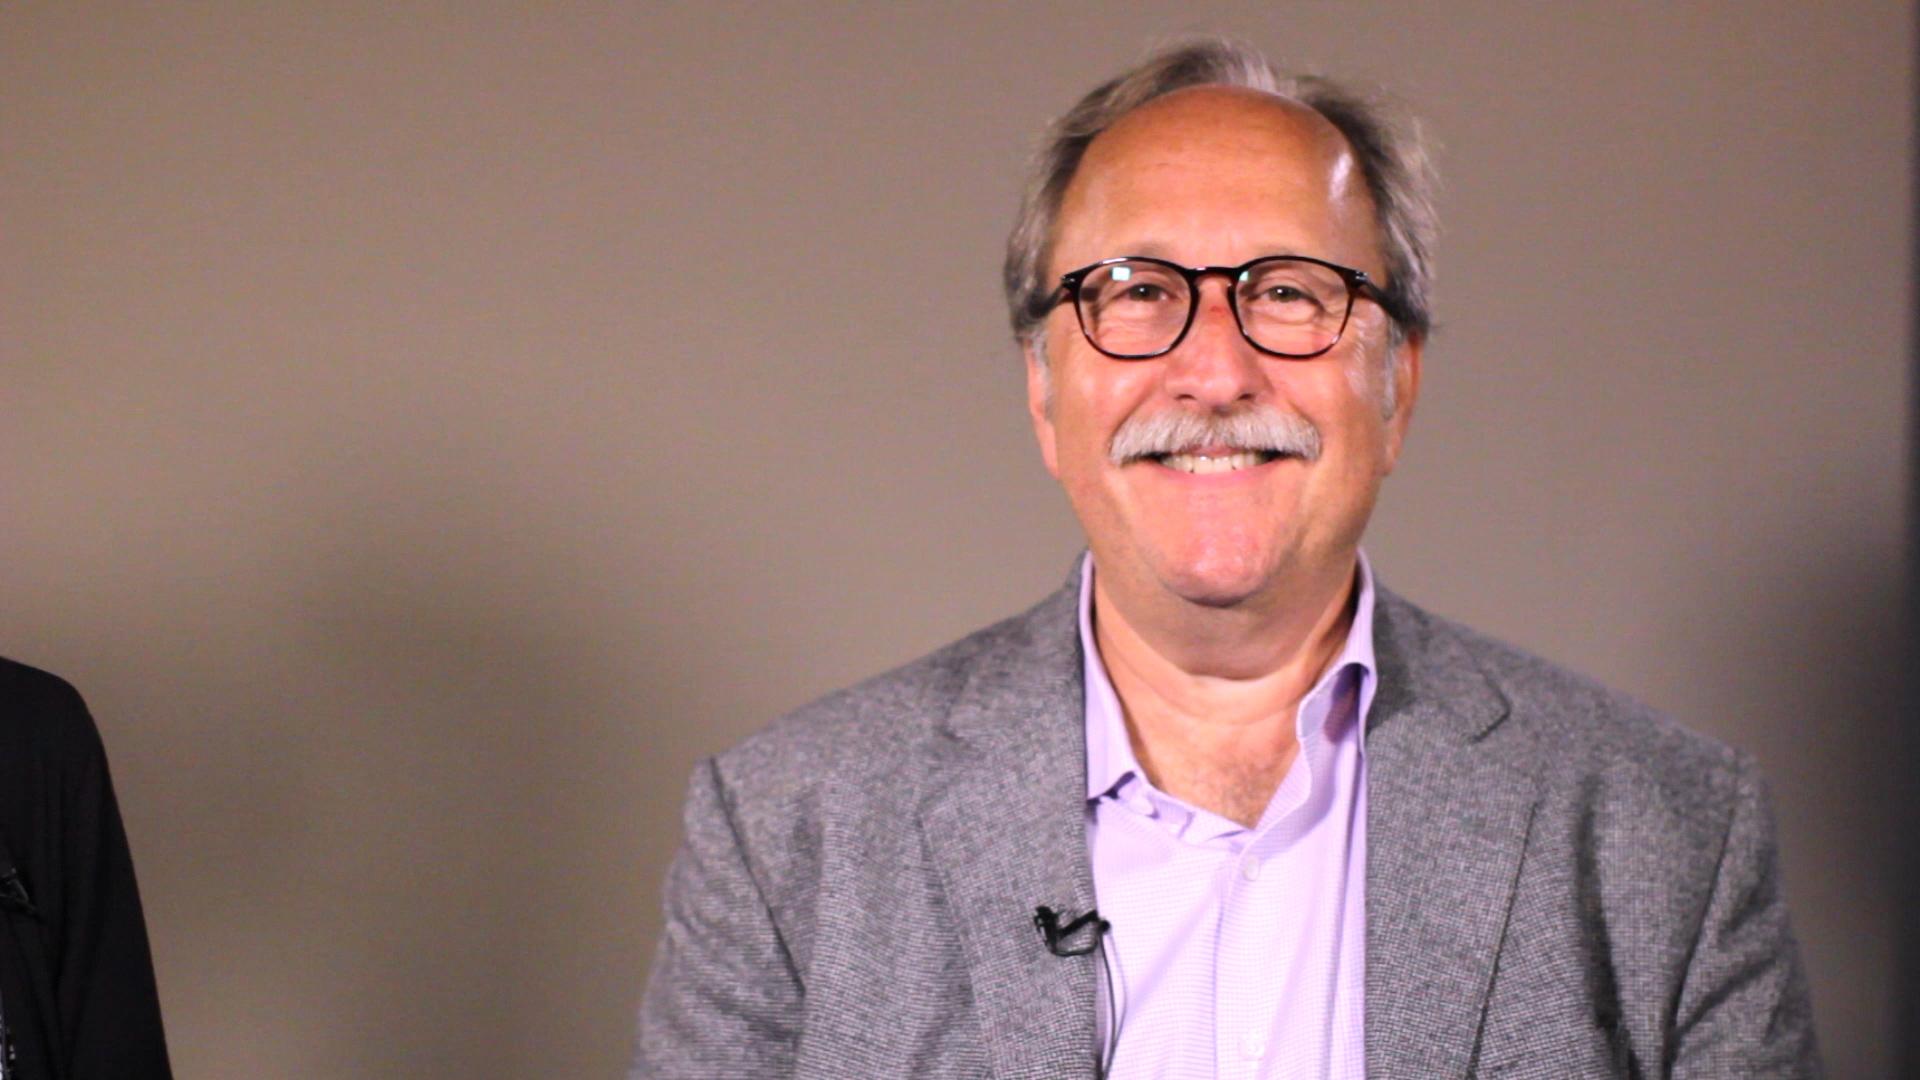 Cary Sherburne and David Zwang Talk drupa News from Heidelberg, Canon, EFI, Landa, Xerox and KBA